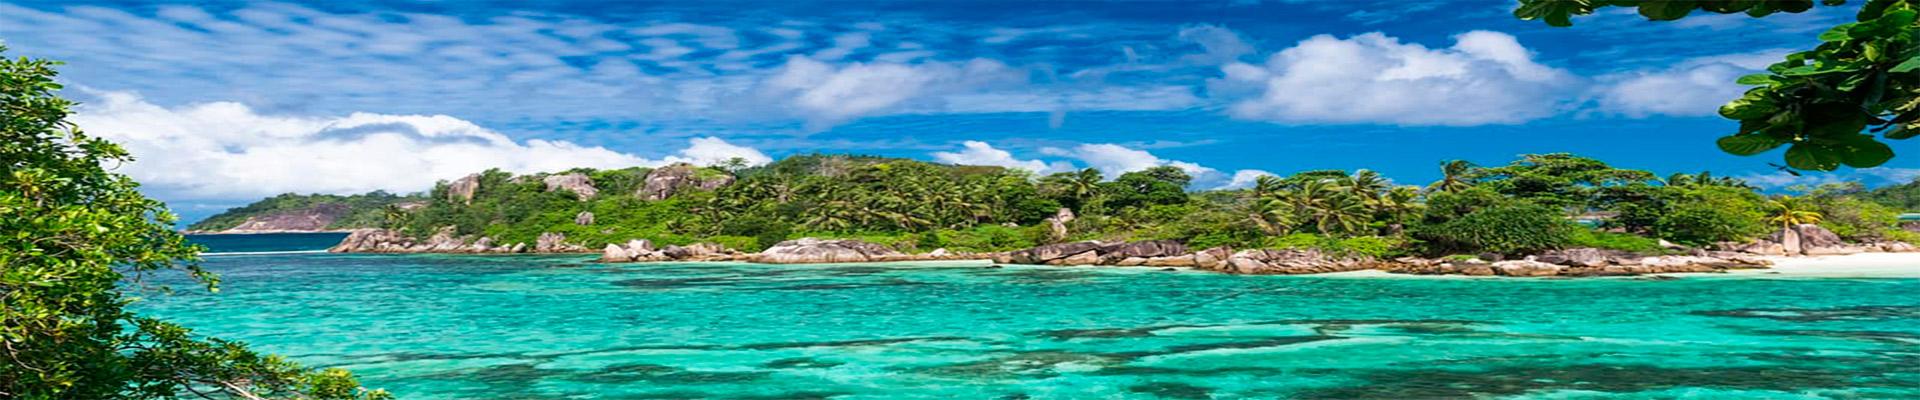 Ilhas Seychelles – Mahe